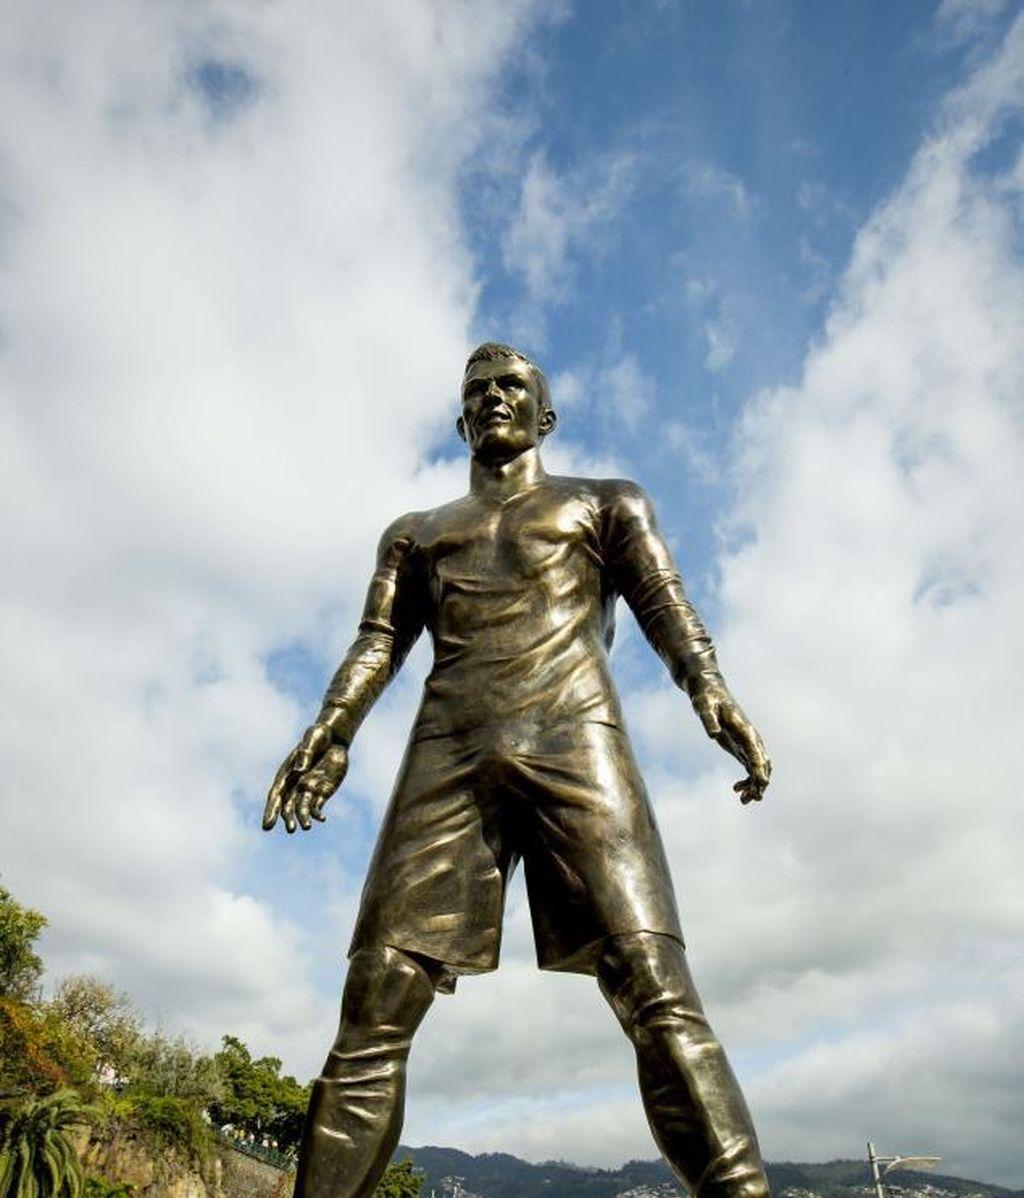 Cristiano Ronaldo, Real Madrid, Estatua